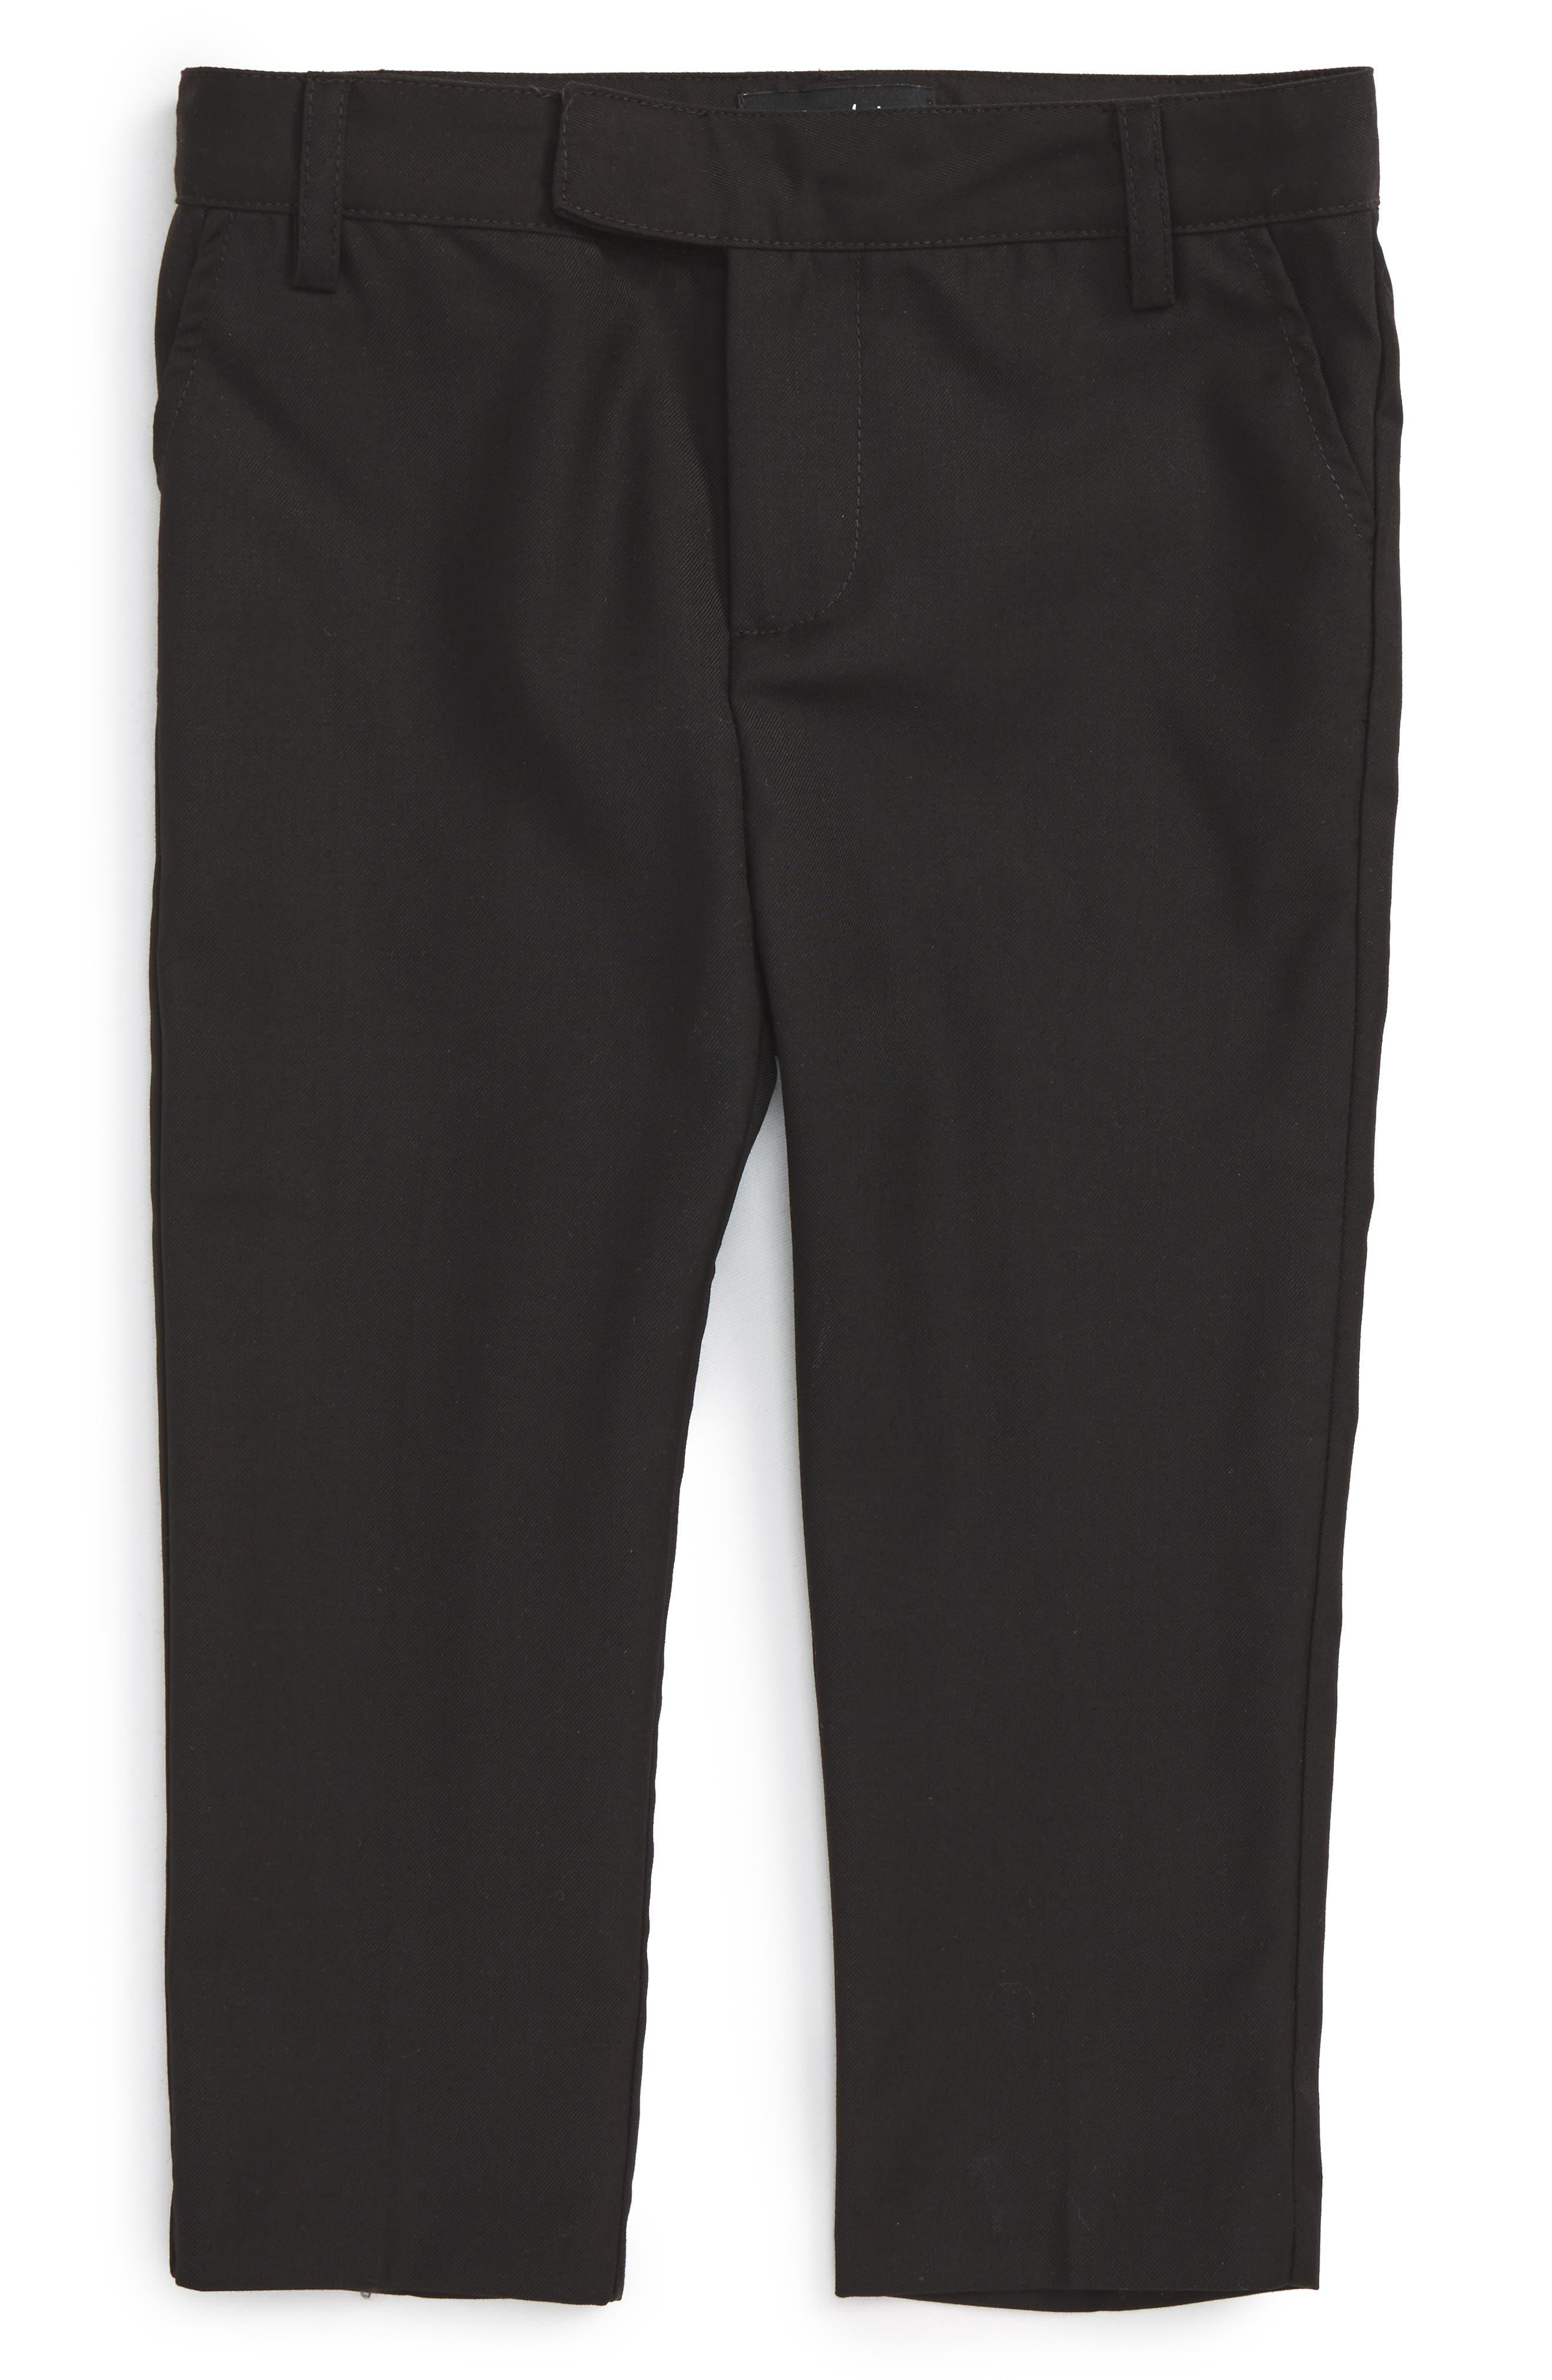 Main Image - Bardot Junior Harry Suit Pants (Baby Boys & Toddler Boys)